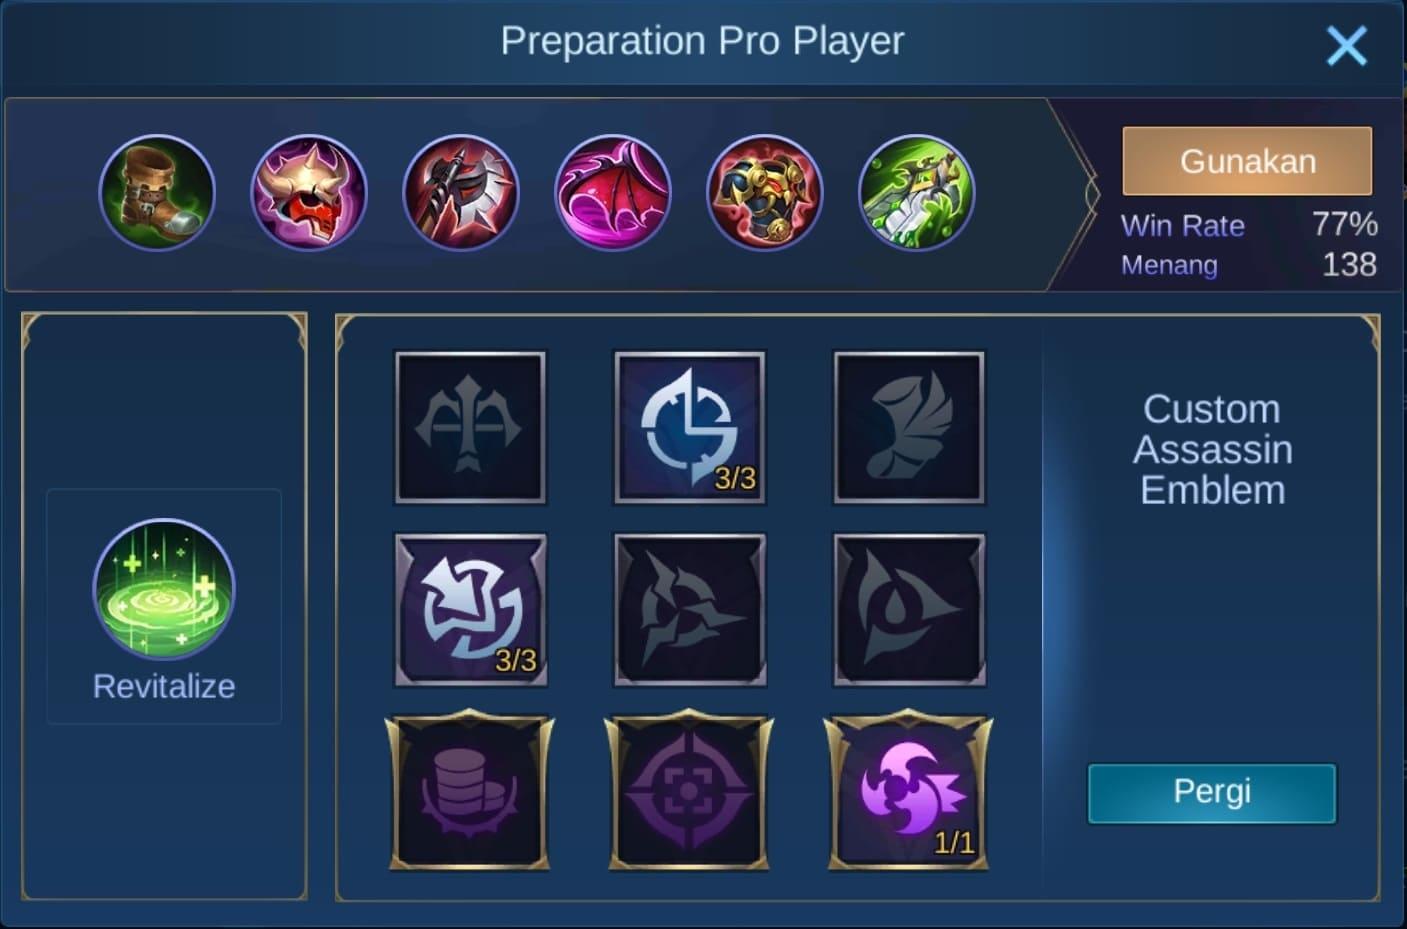 build item balmond mobile legends (ML)